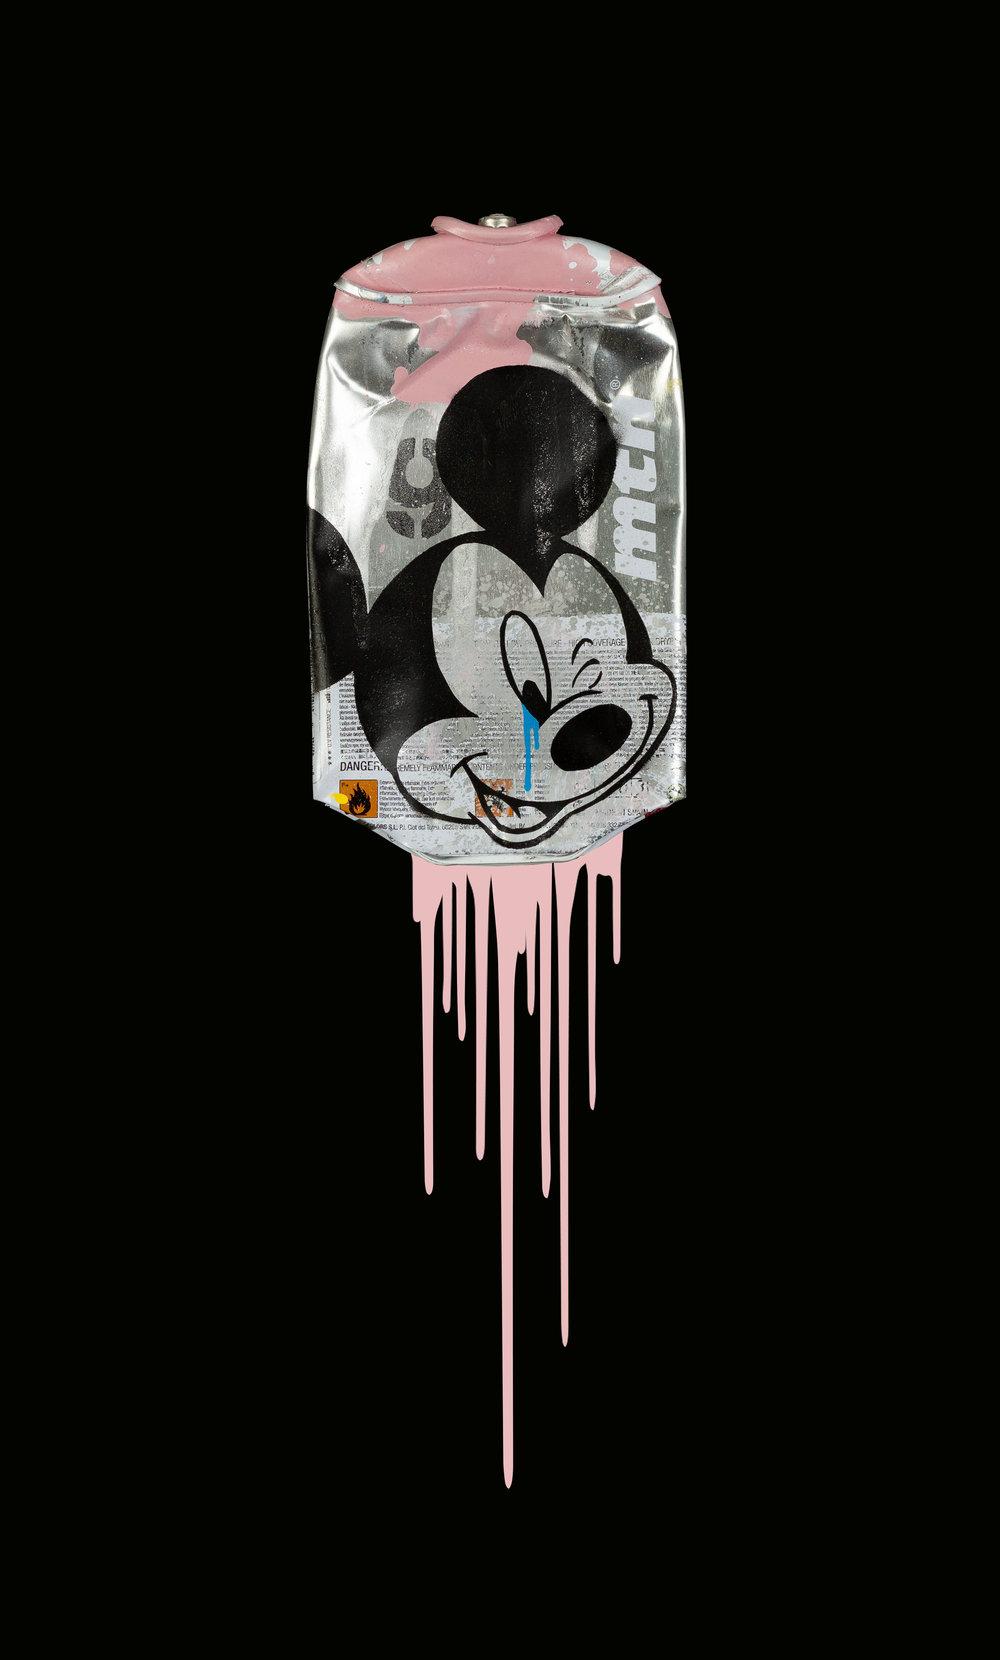 Mickey-01.jpg